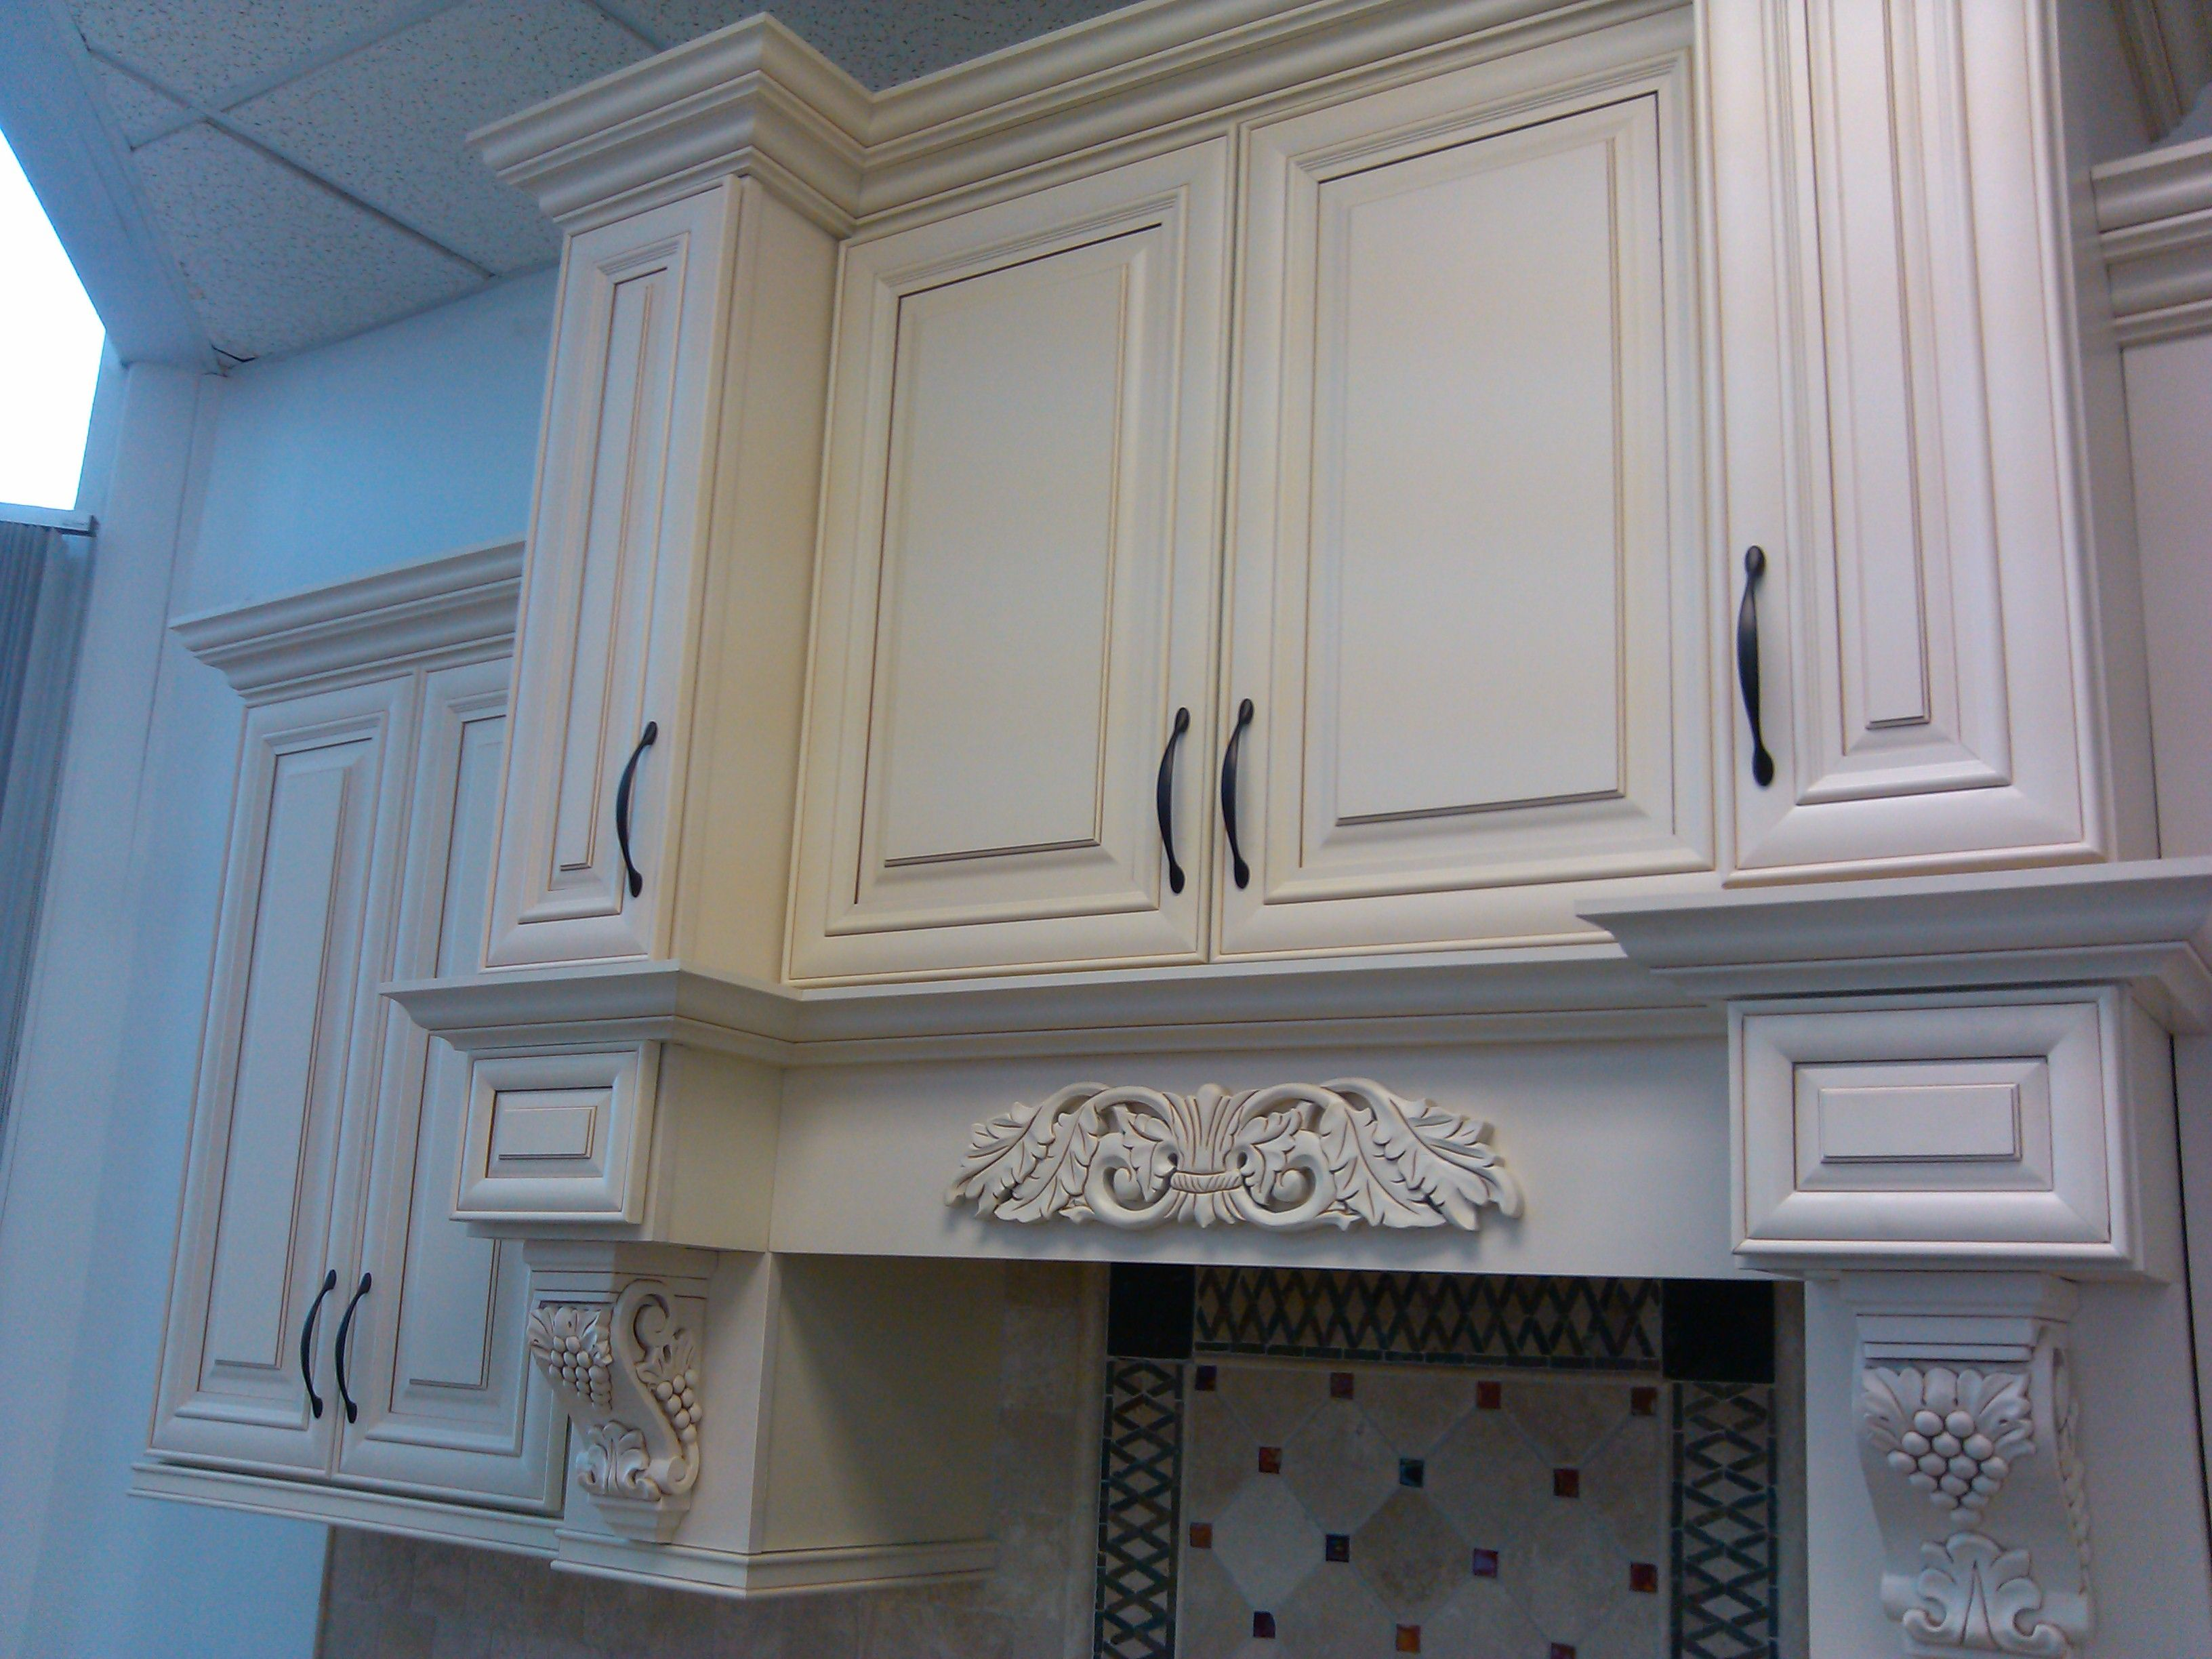 Cream Maple Glaze Rta Cabinets From Cabinetsdirectrta Com Glazed Kitchen Cabinets Kitchen Cabinet Design Kitchen Cabinets